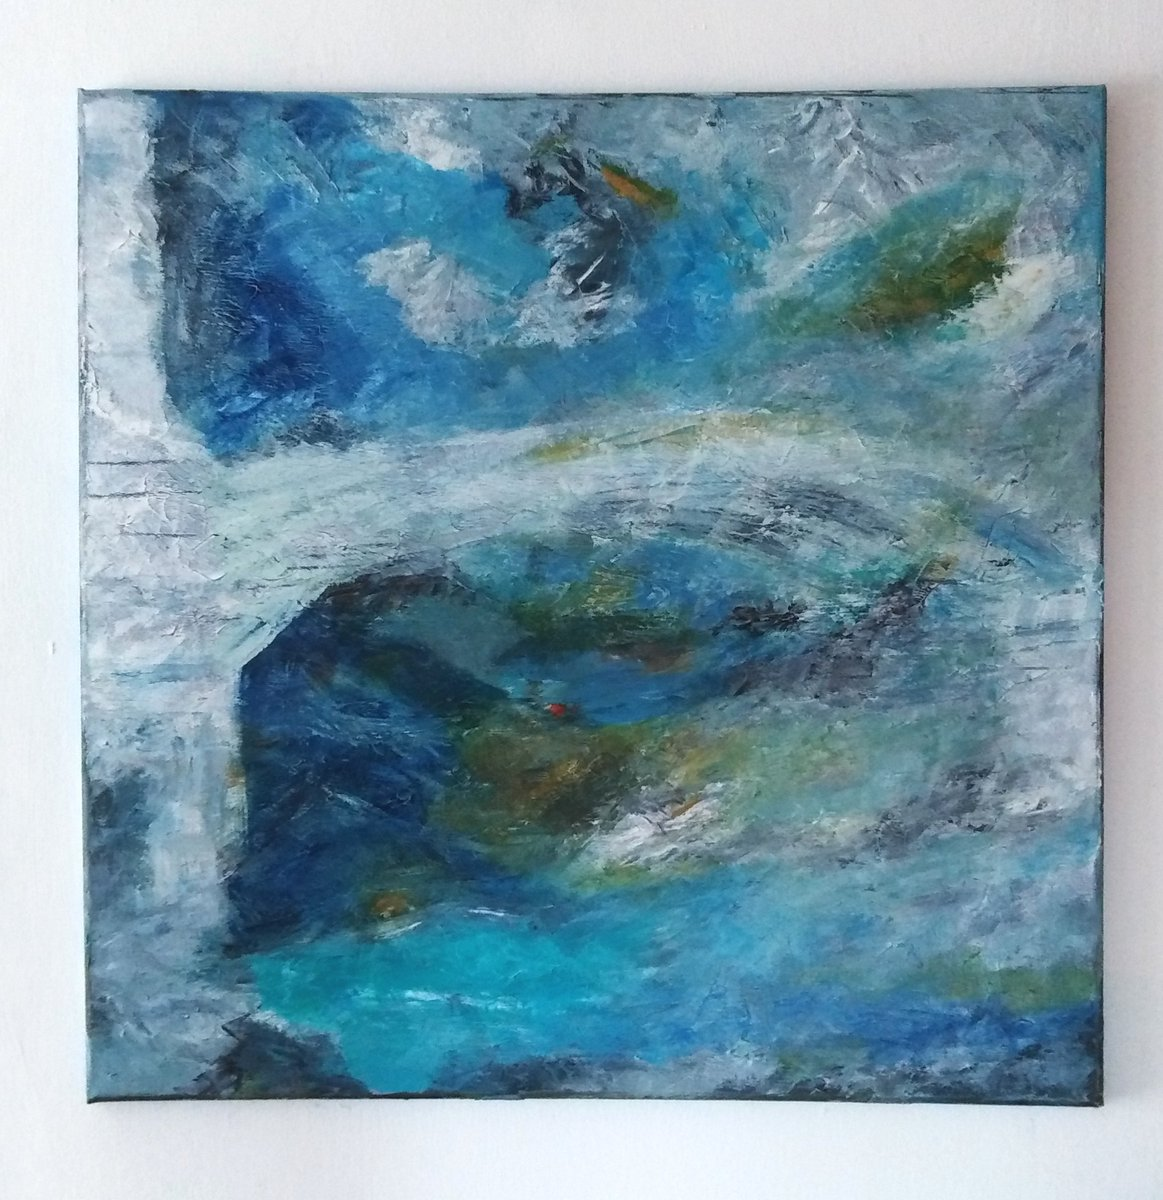 Water Under the Bridge - Oil on Box Canvas 60cm x 60cm #art #artwork  #abstractpainting #abstract #artist #oilpainting #stives #london #cornwall #modernart #contemporaryart #landscape #seascape #bridge #twitart #artistsontwitter #artgallery https://t.co/gYVyvlDw6H